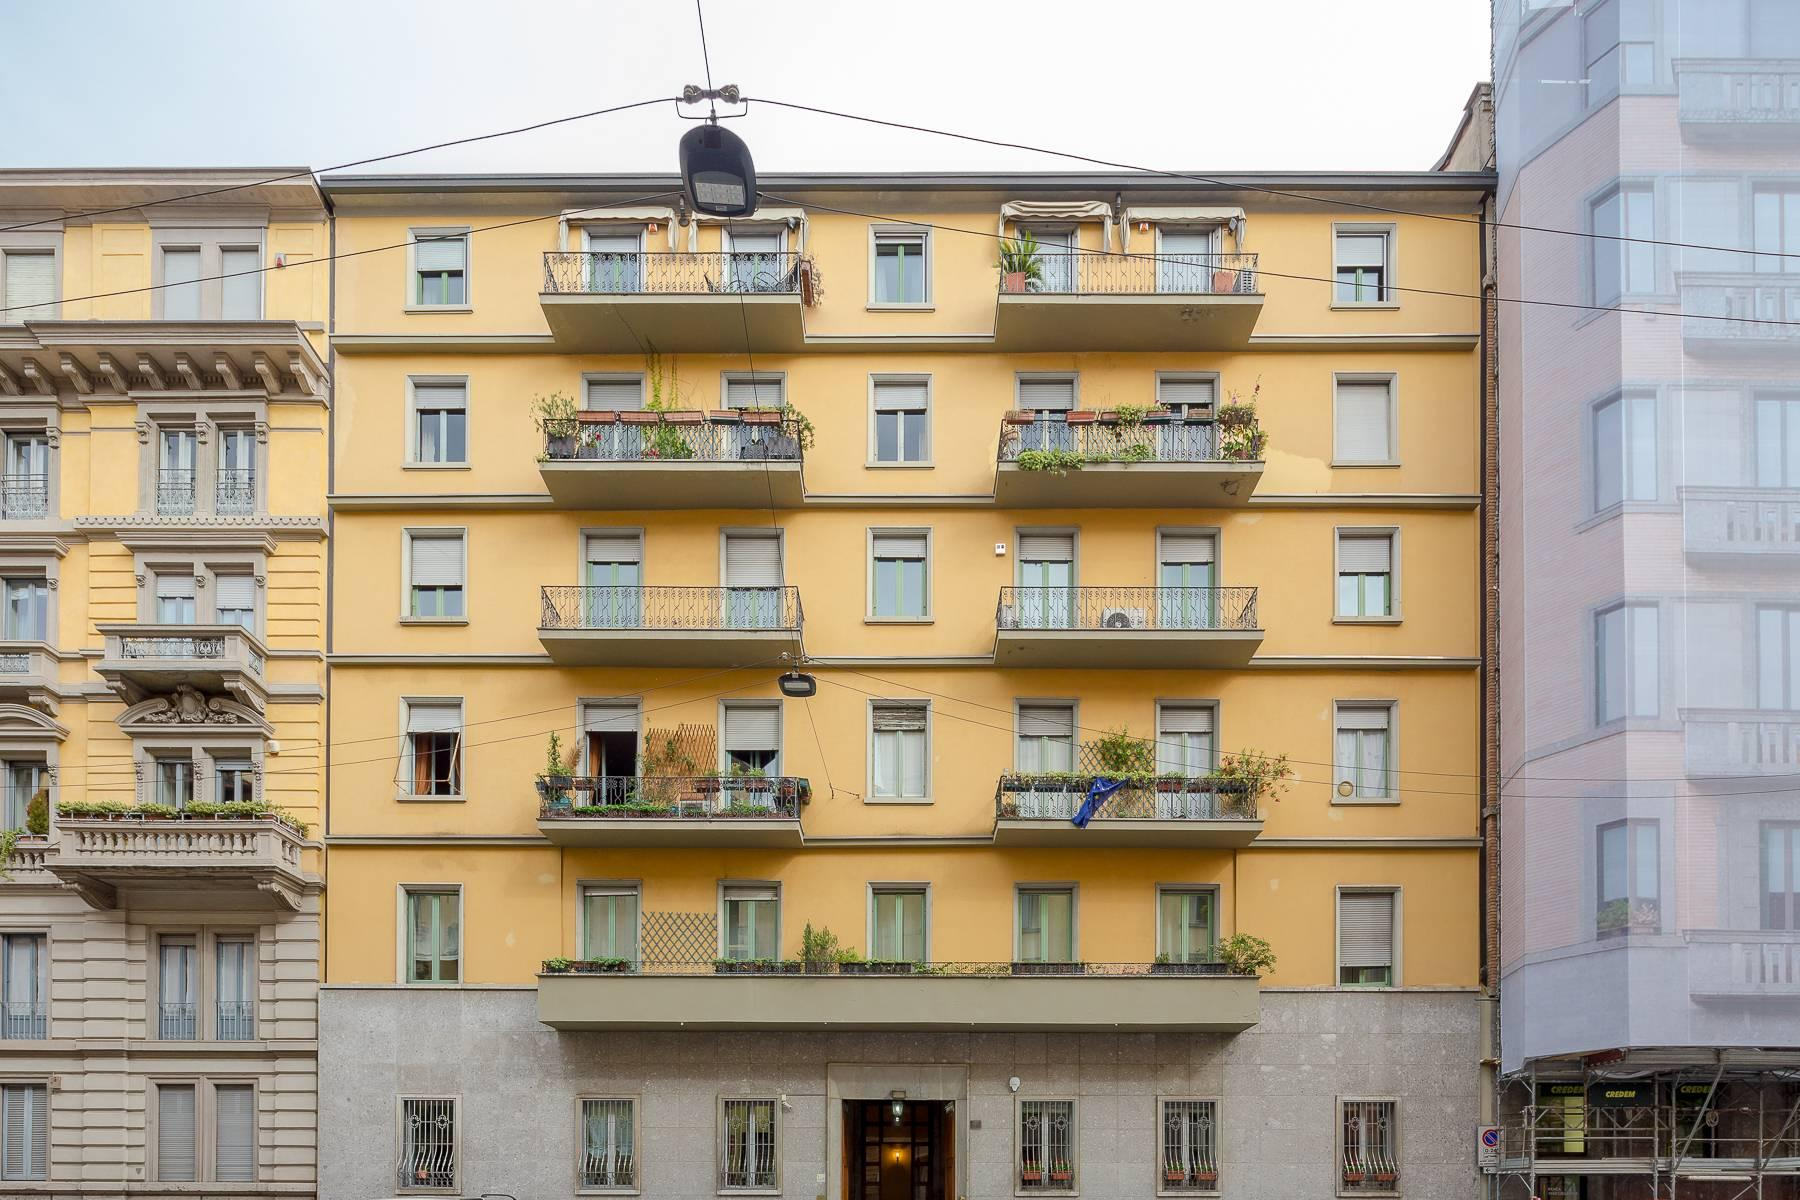 Open space office/residential property in Piazza Giovine Italia/Via Aurelio Saffi - 24